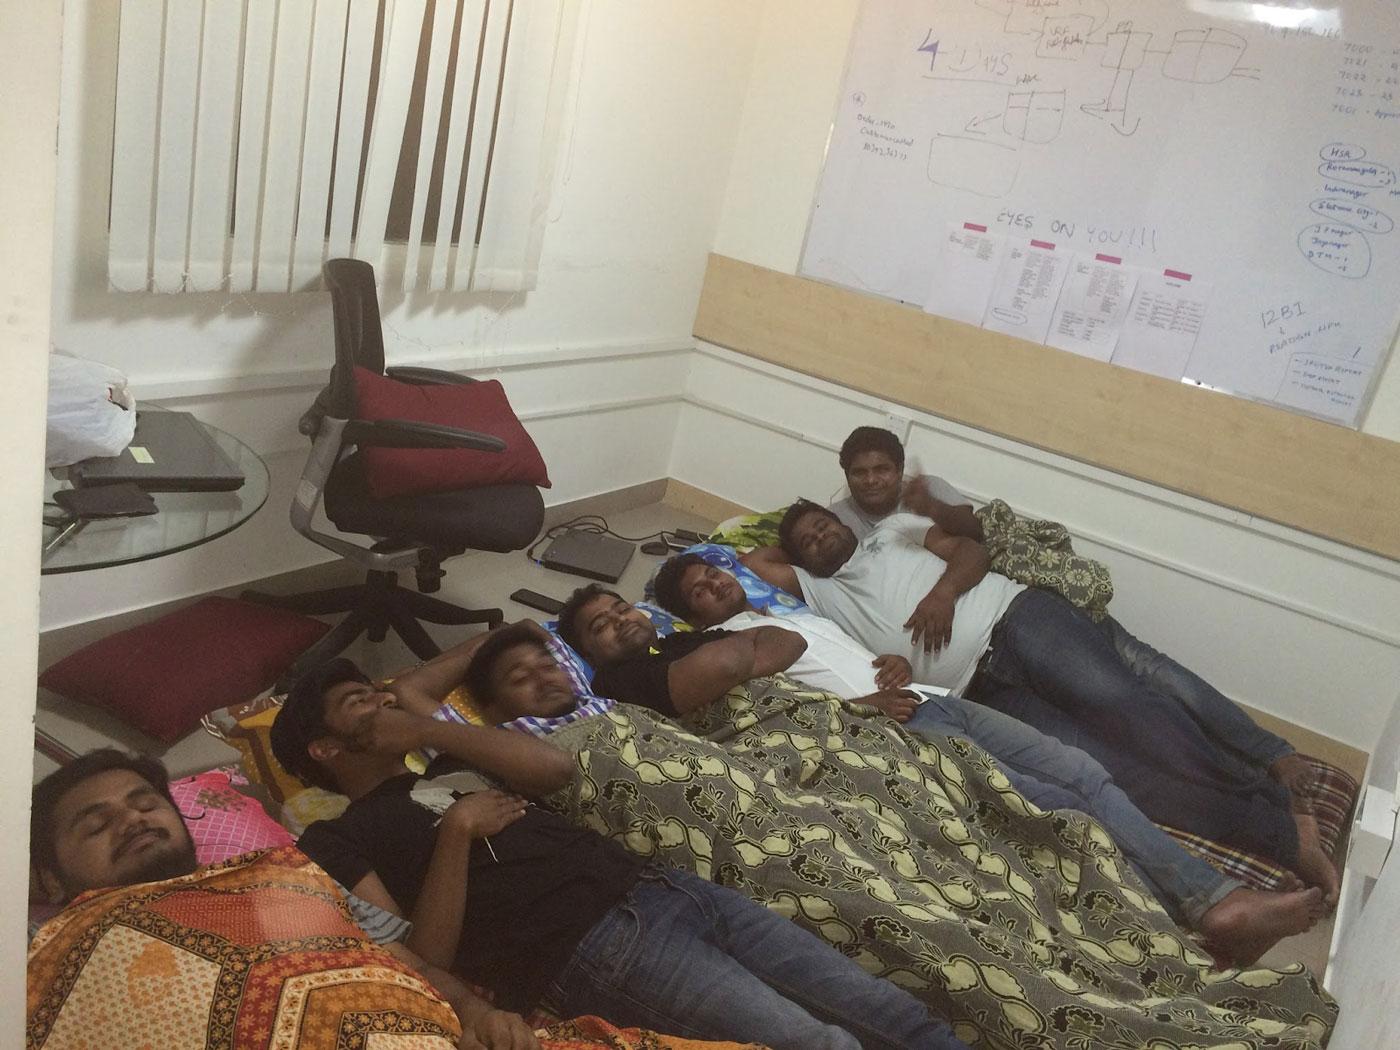 Meet The Ninjacart Team | Early Days of Ninjacart Team - Founders sleeping in the office